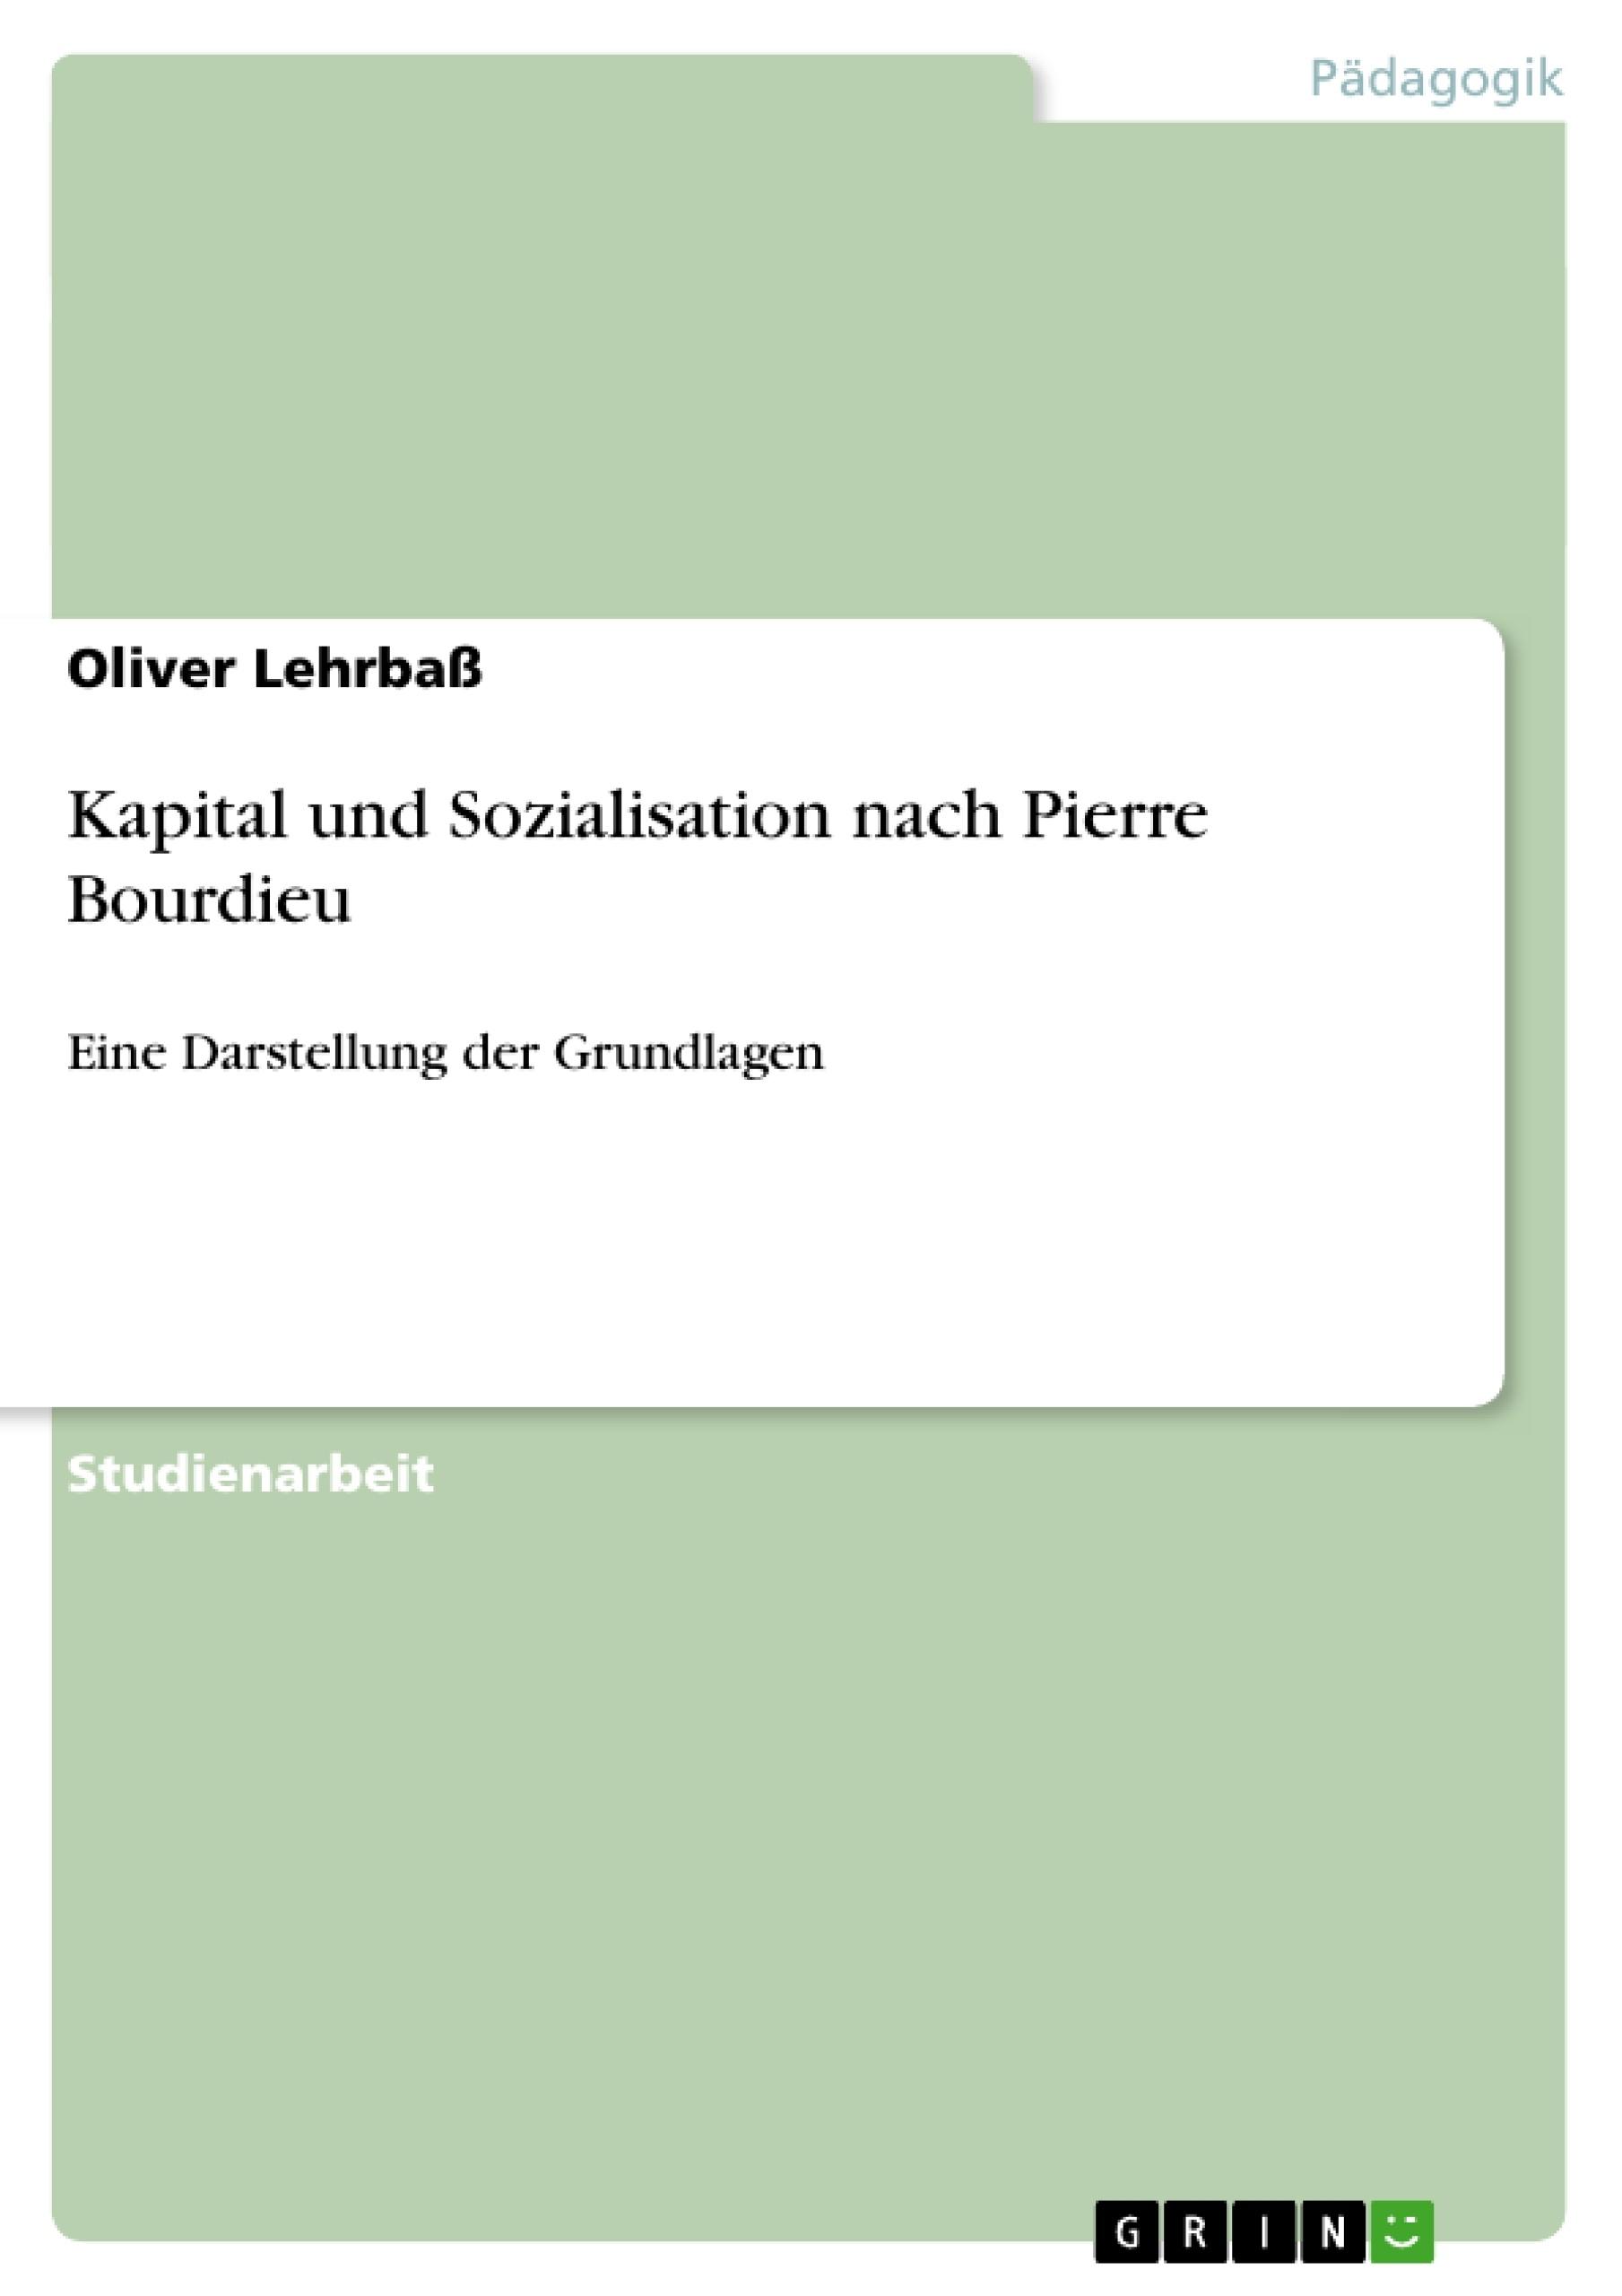 Titel: Kapital und Sozialisation nach Pierre Bourdieu